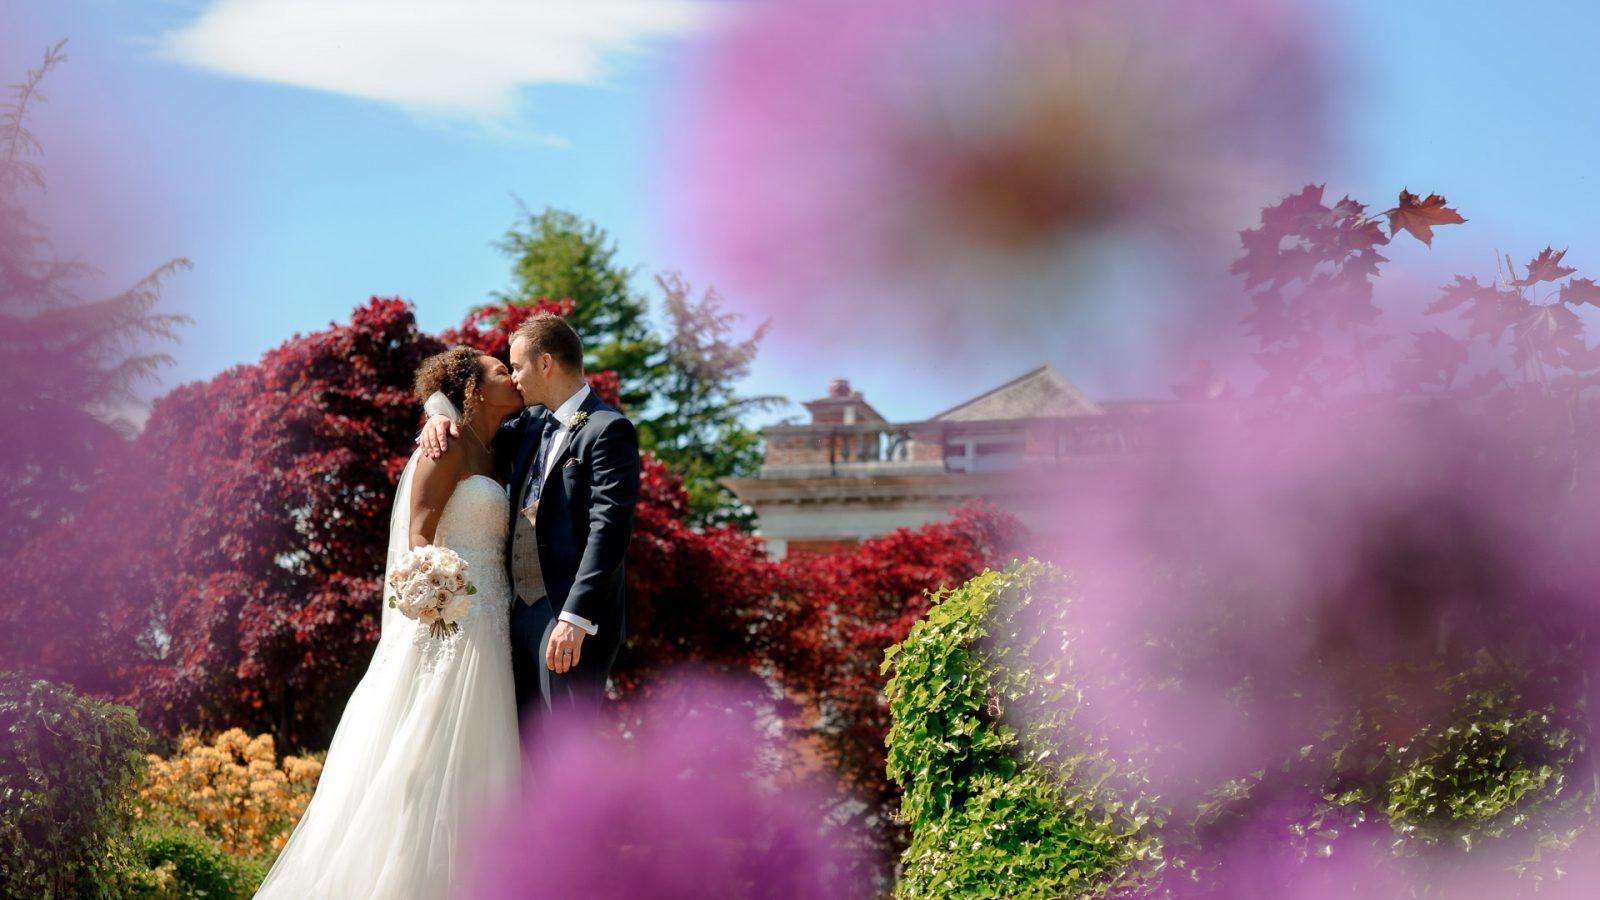 best-wedding-photos-2017-kimberley-and-joseph-kiss